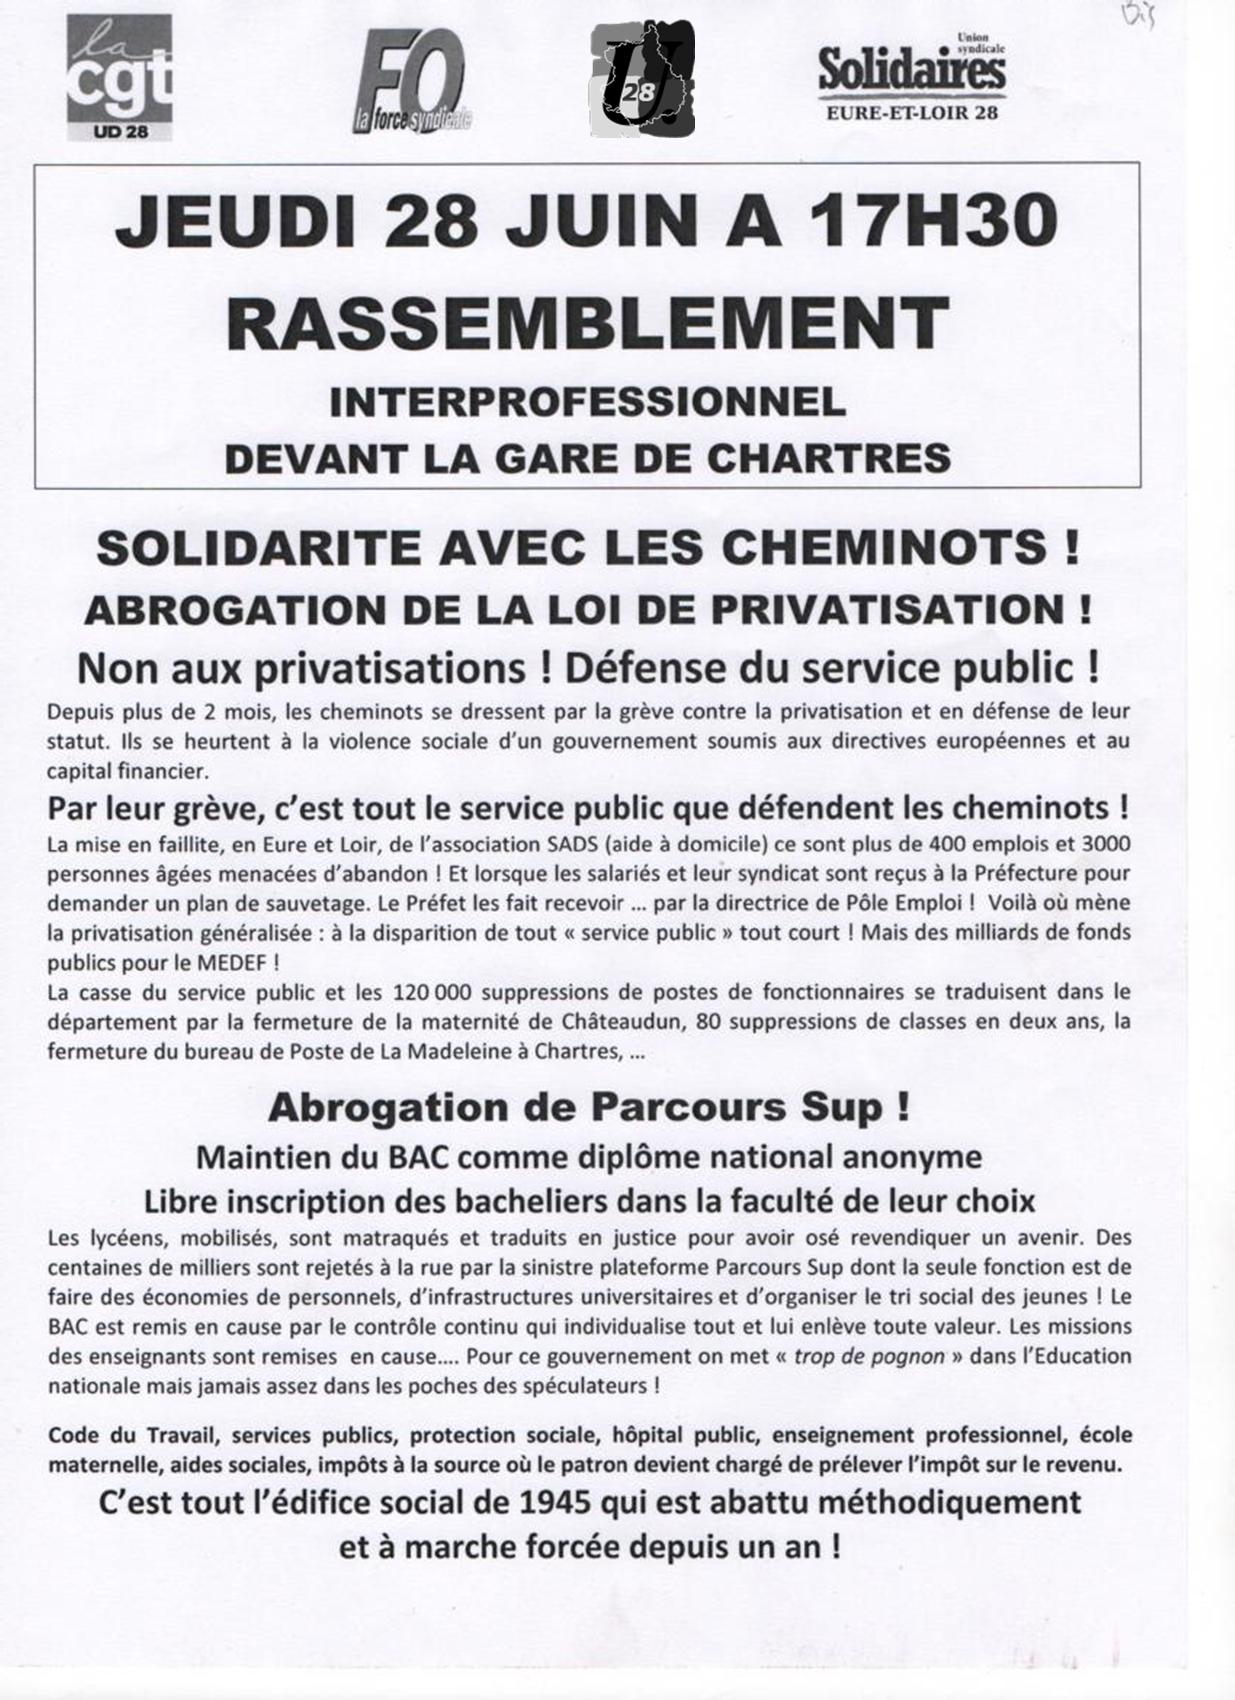 Chartres CGT FO FSU SolidairesTract Rasemblement 28 juin 2018 - 1x2